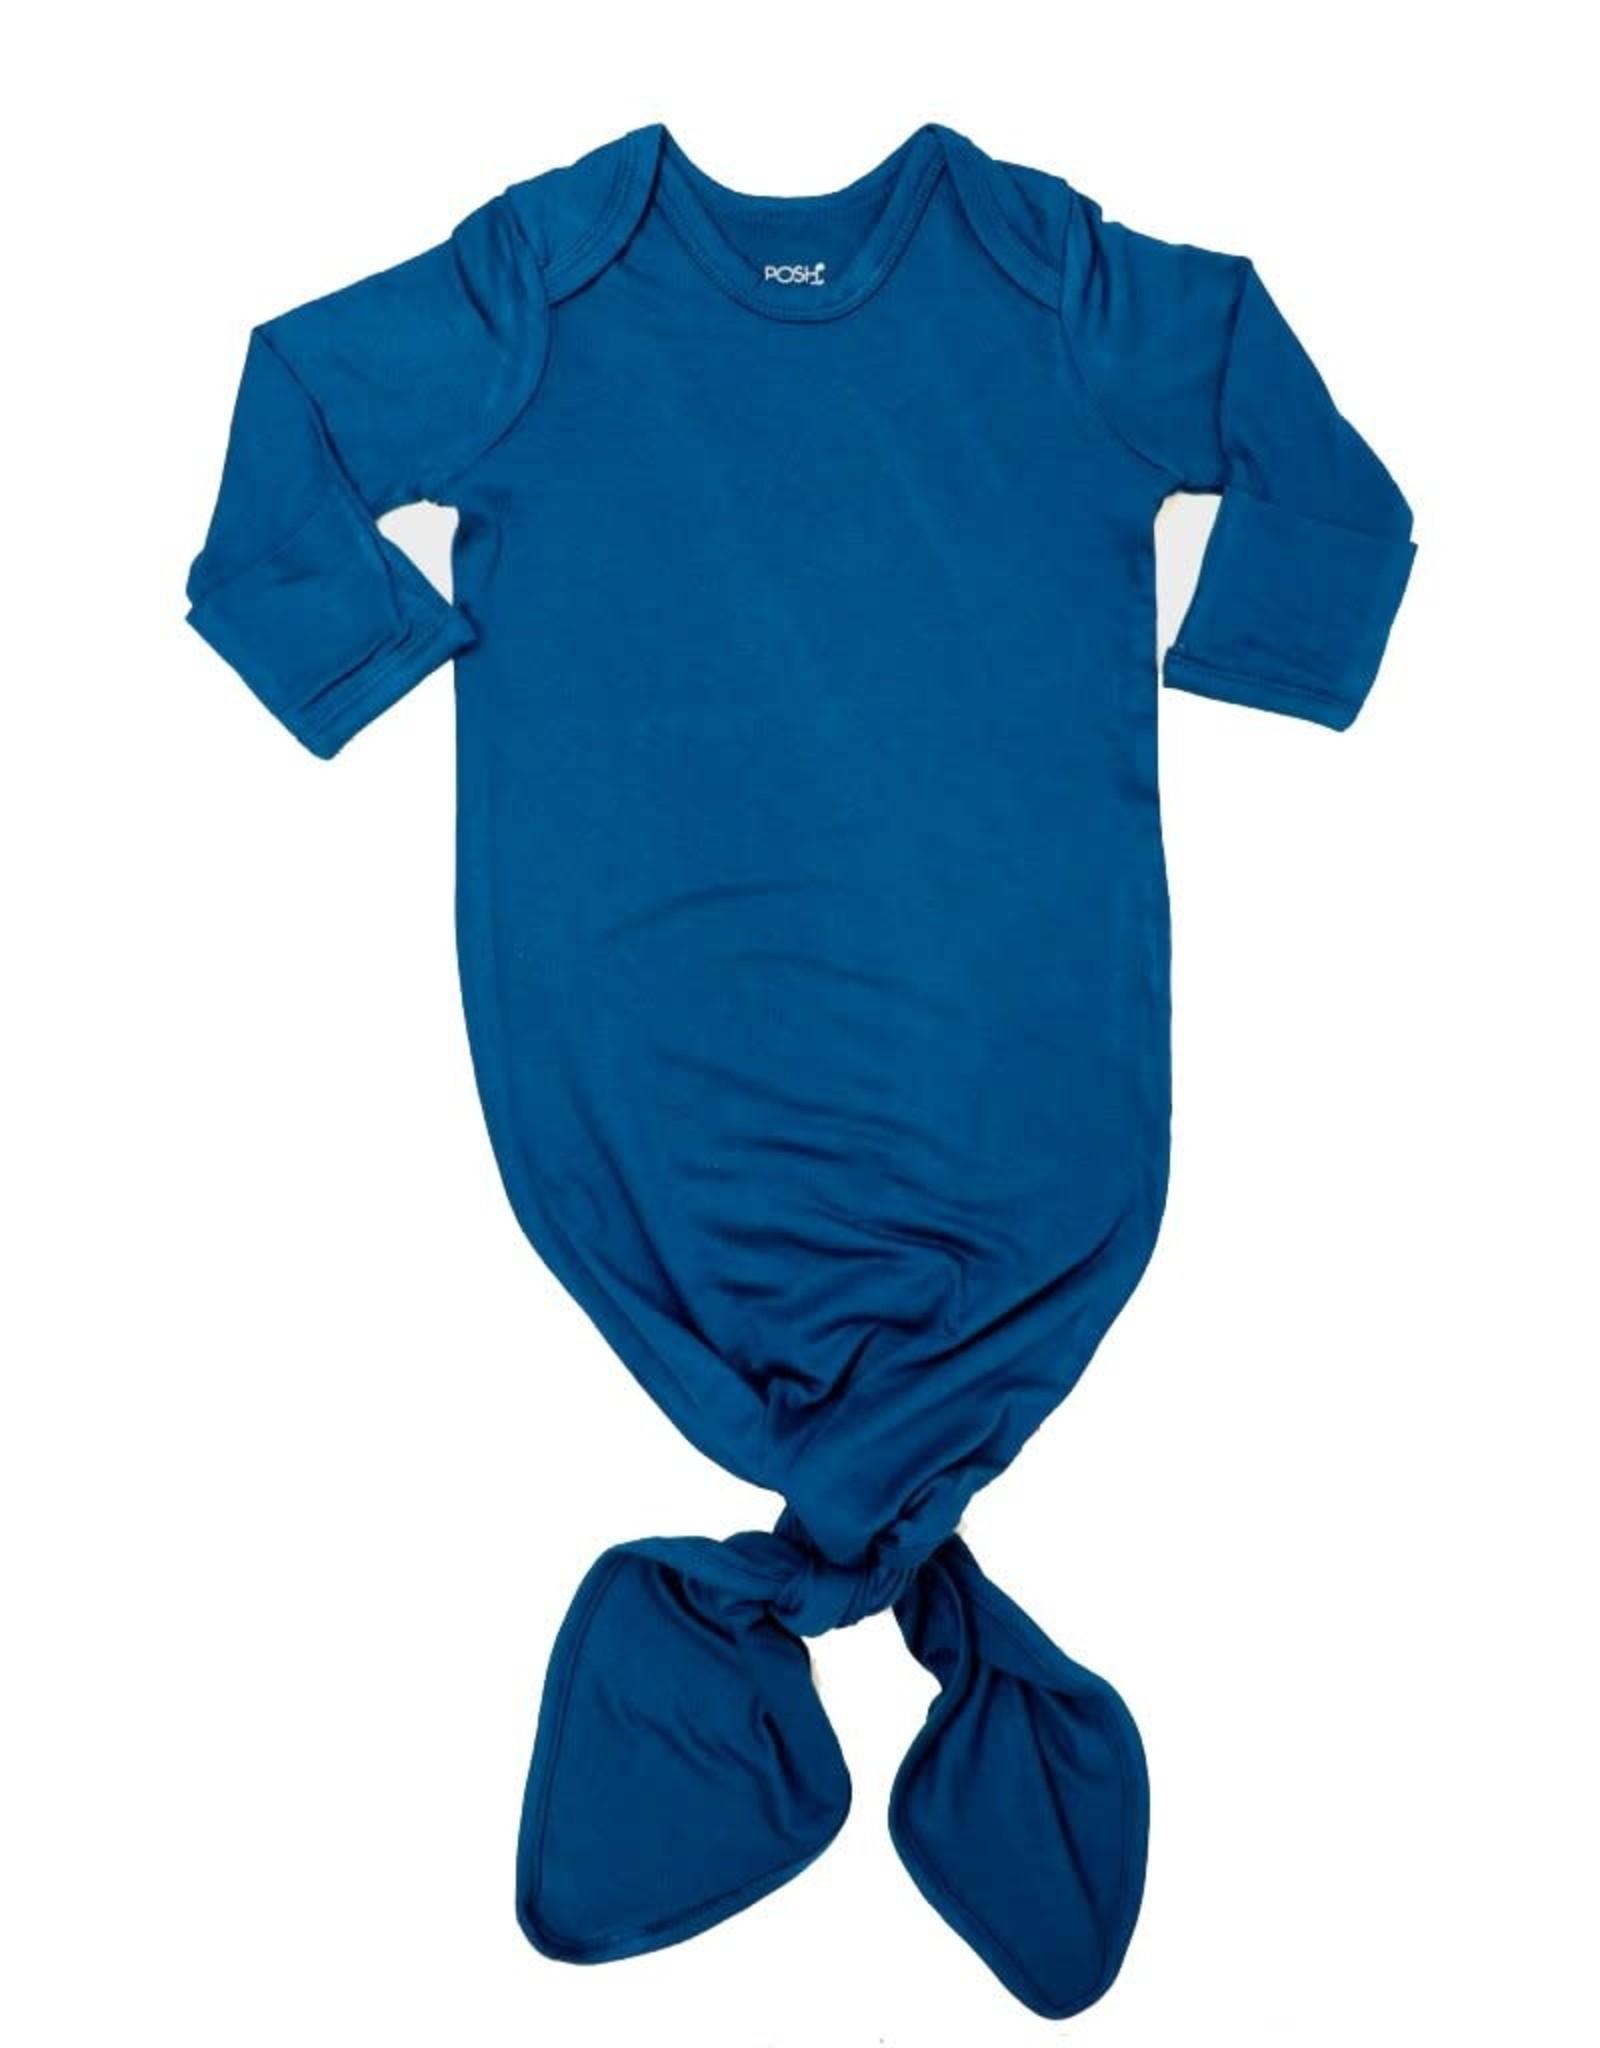 Posh Peanut Sailor Blue Knotted Gown